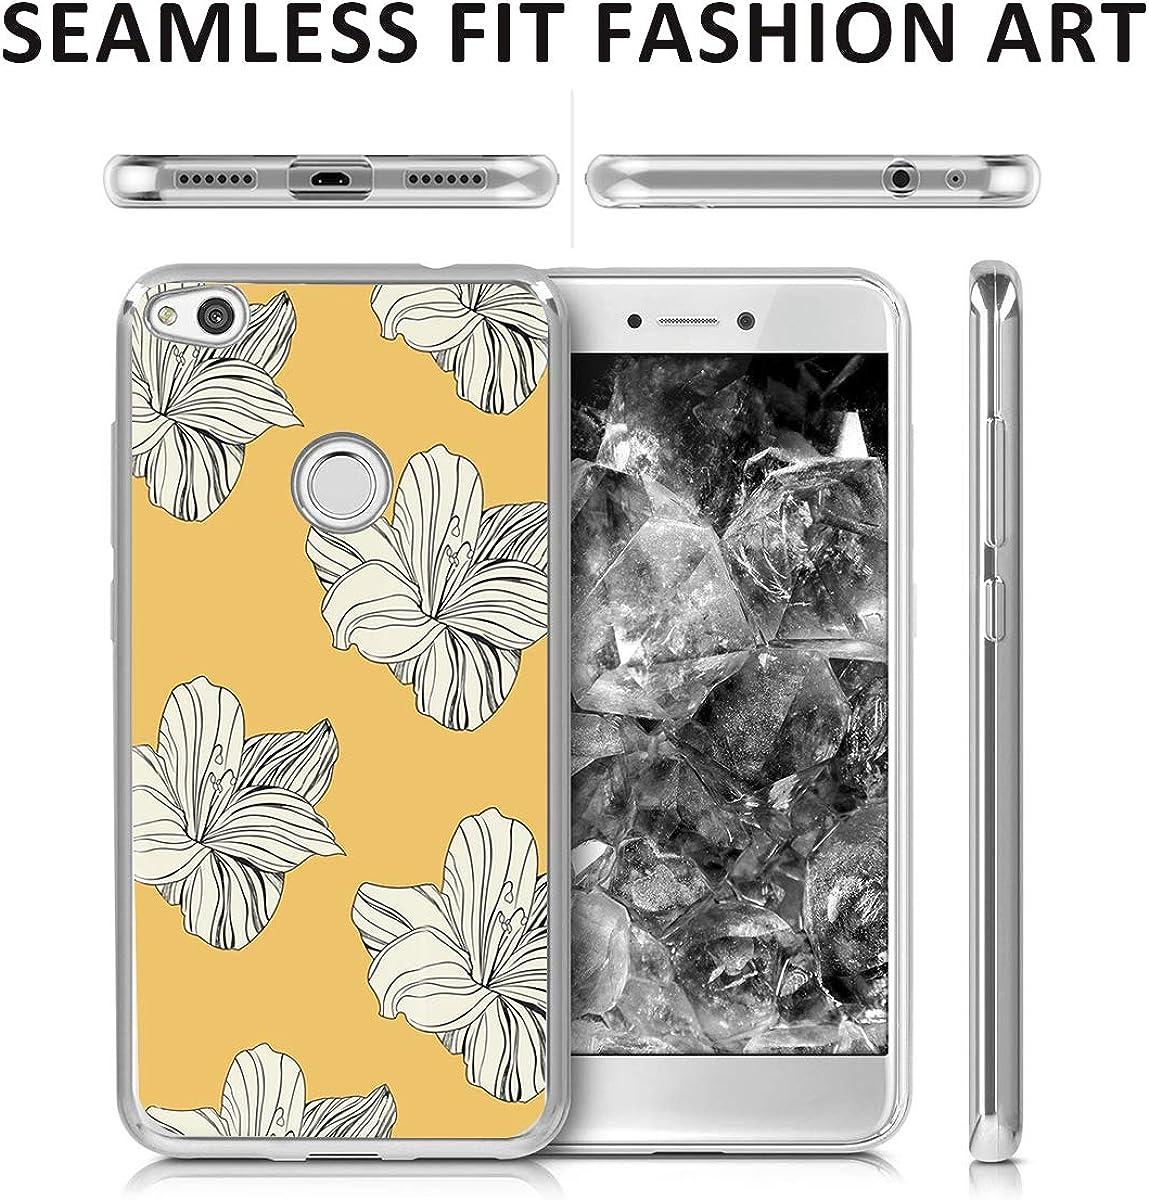 Qissy Carcasa Huawei P8 Lite 2017 // Honor 8 Lite//Nova Lite Gel TPU Silicona Flexible Cubierta Ultra Slim Cut Animals Suave Protective Case Cover Skin para Huawei P8 Lite 2017 5.2 Pulgadas